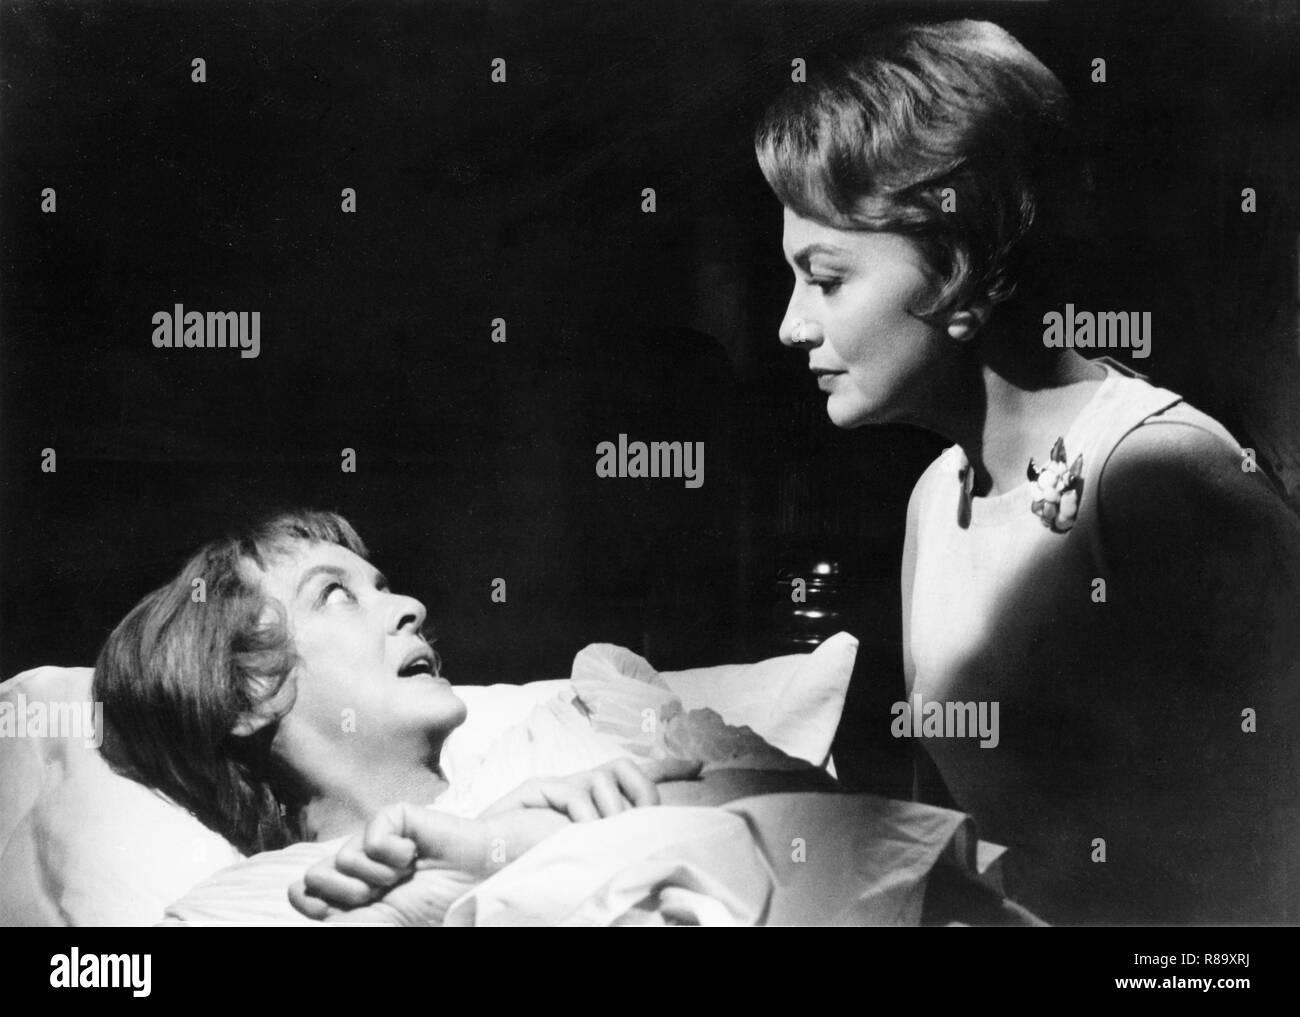 Hush...Hush, Sweet Charlotte Year : 1964 USA Director : Robert Aldrich Bette Davis, Olivia de Havilland - Stock Image